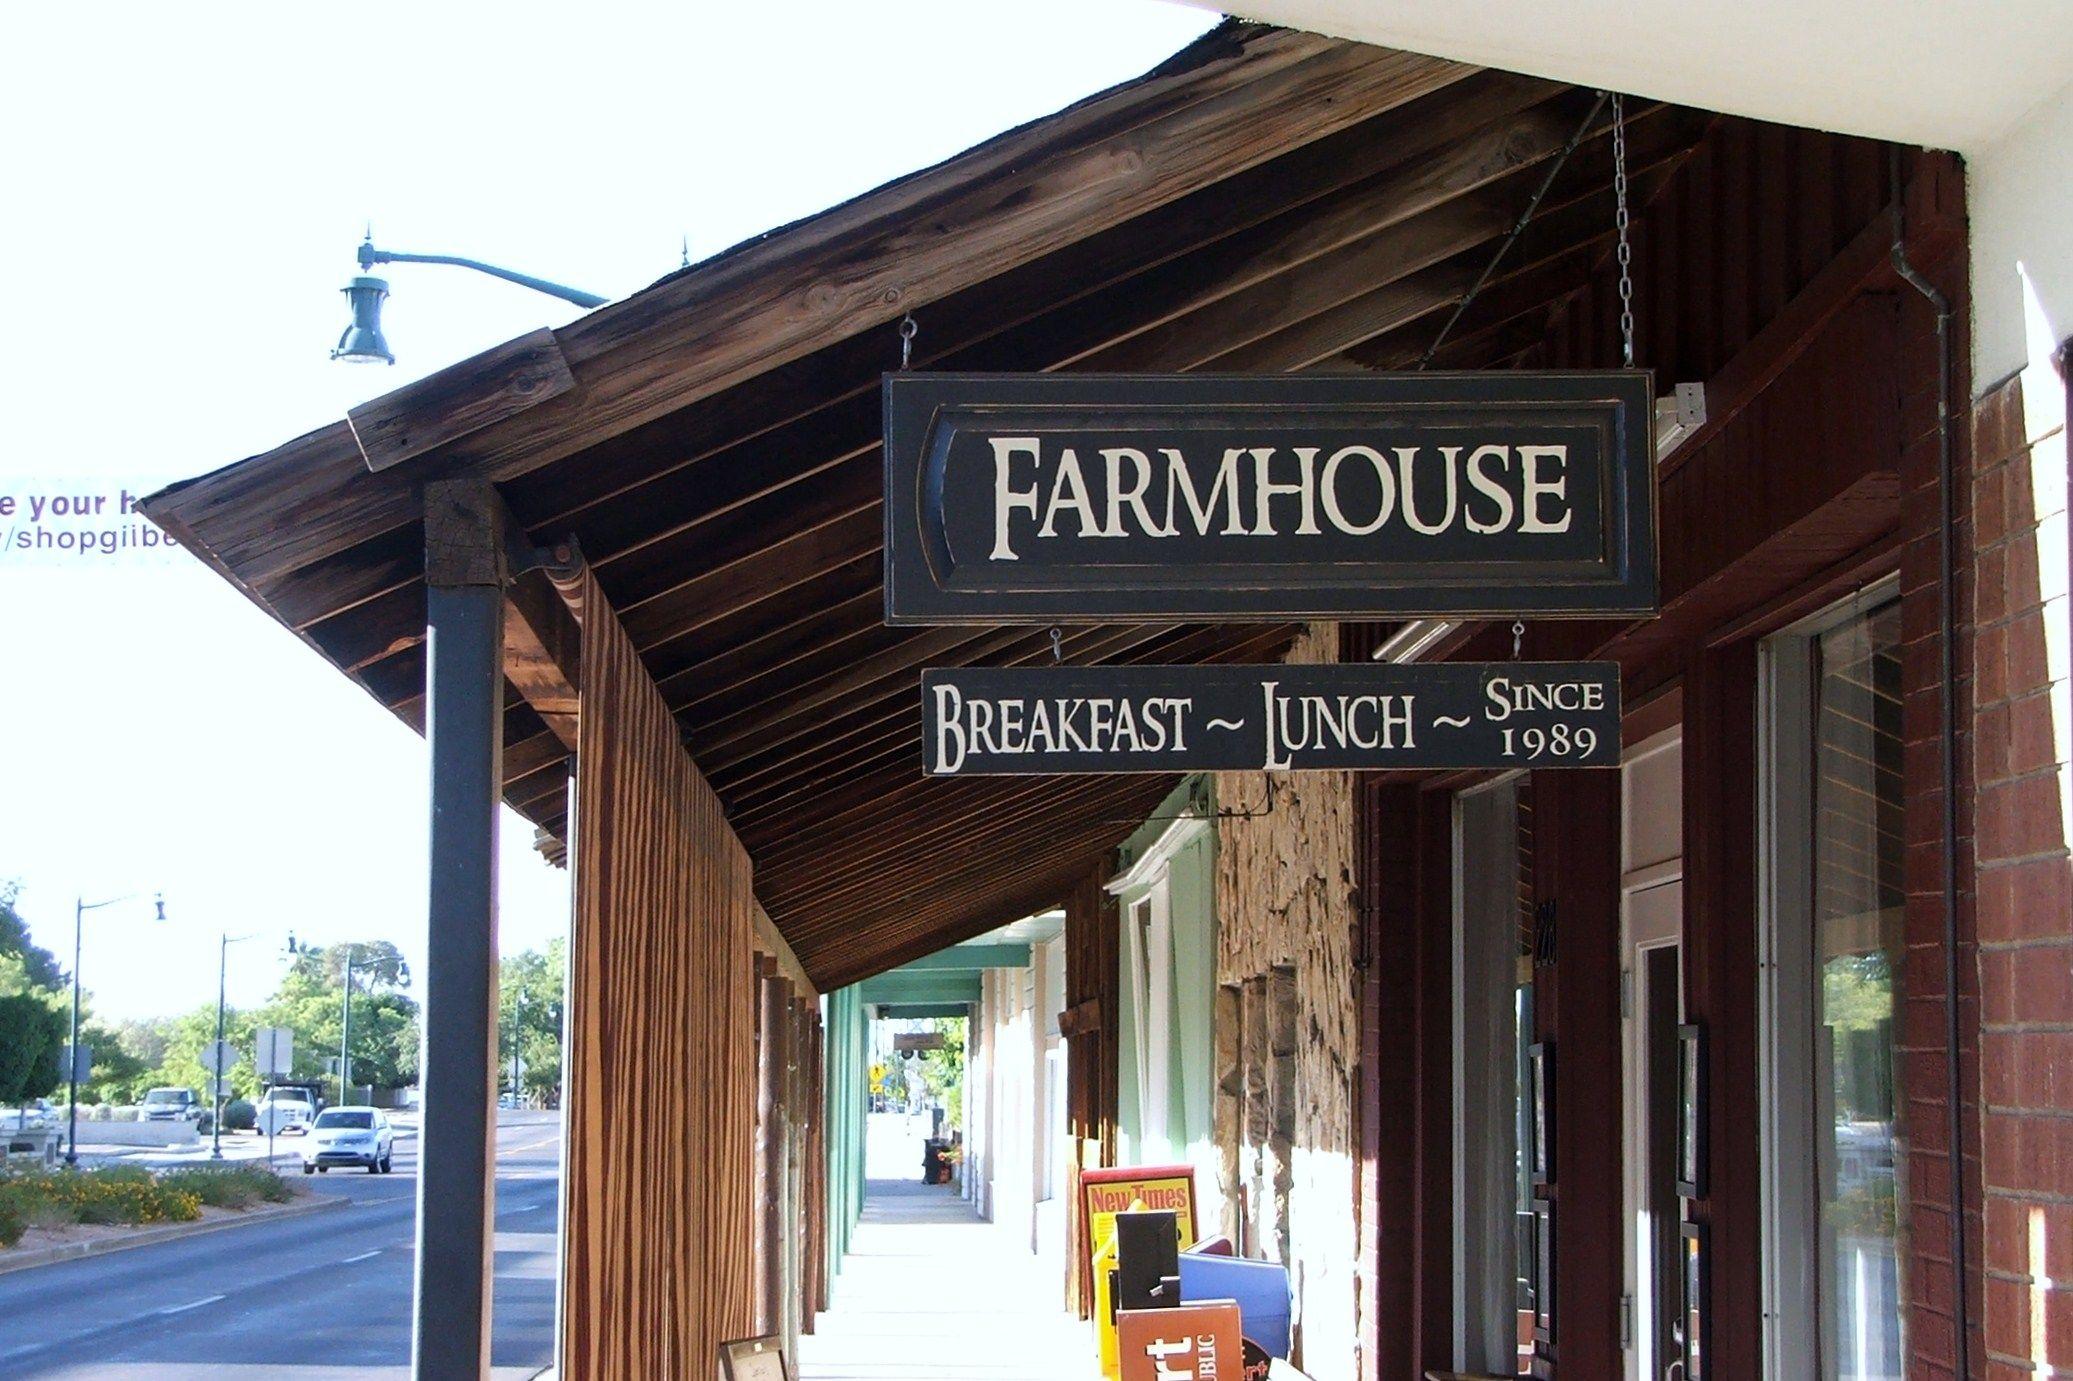 The Farmhouse Restaurant In Downtown Gilbert Serves